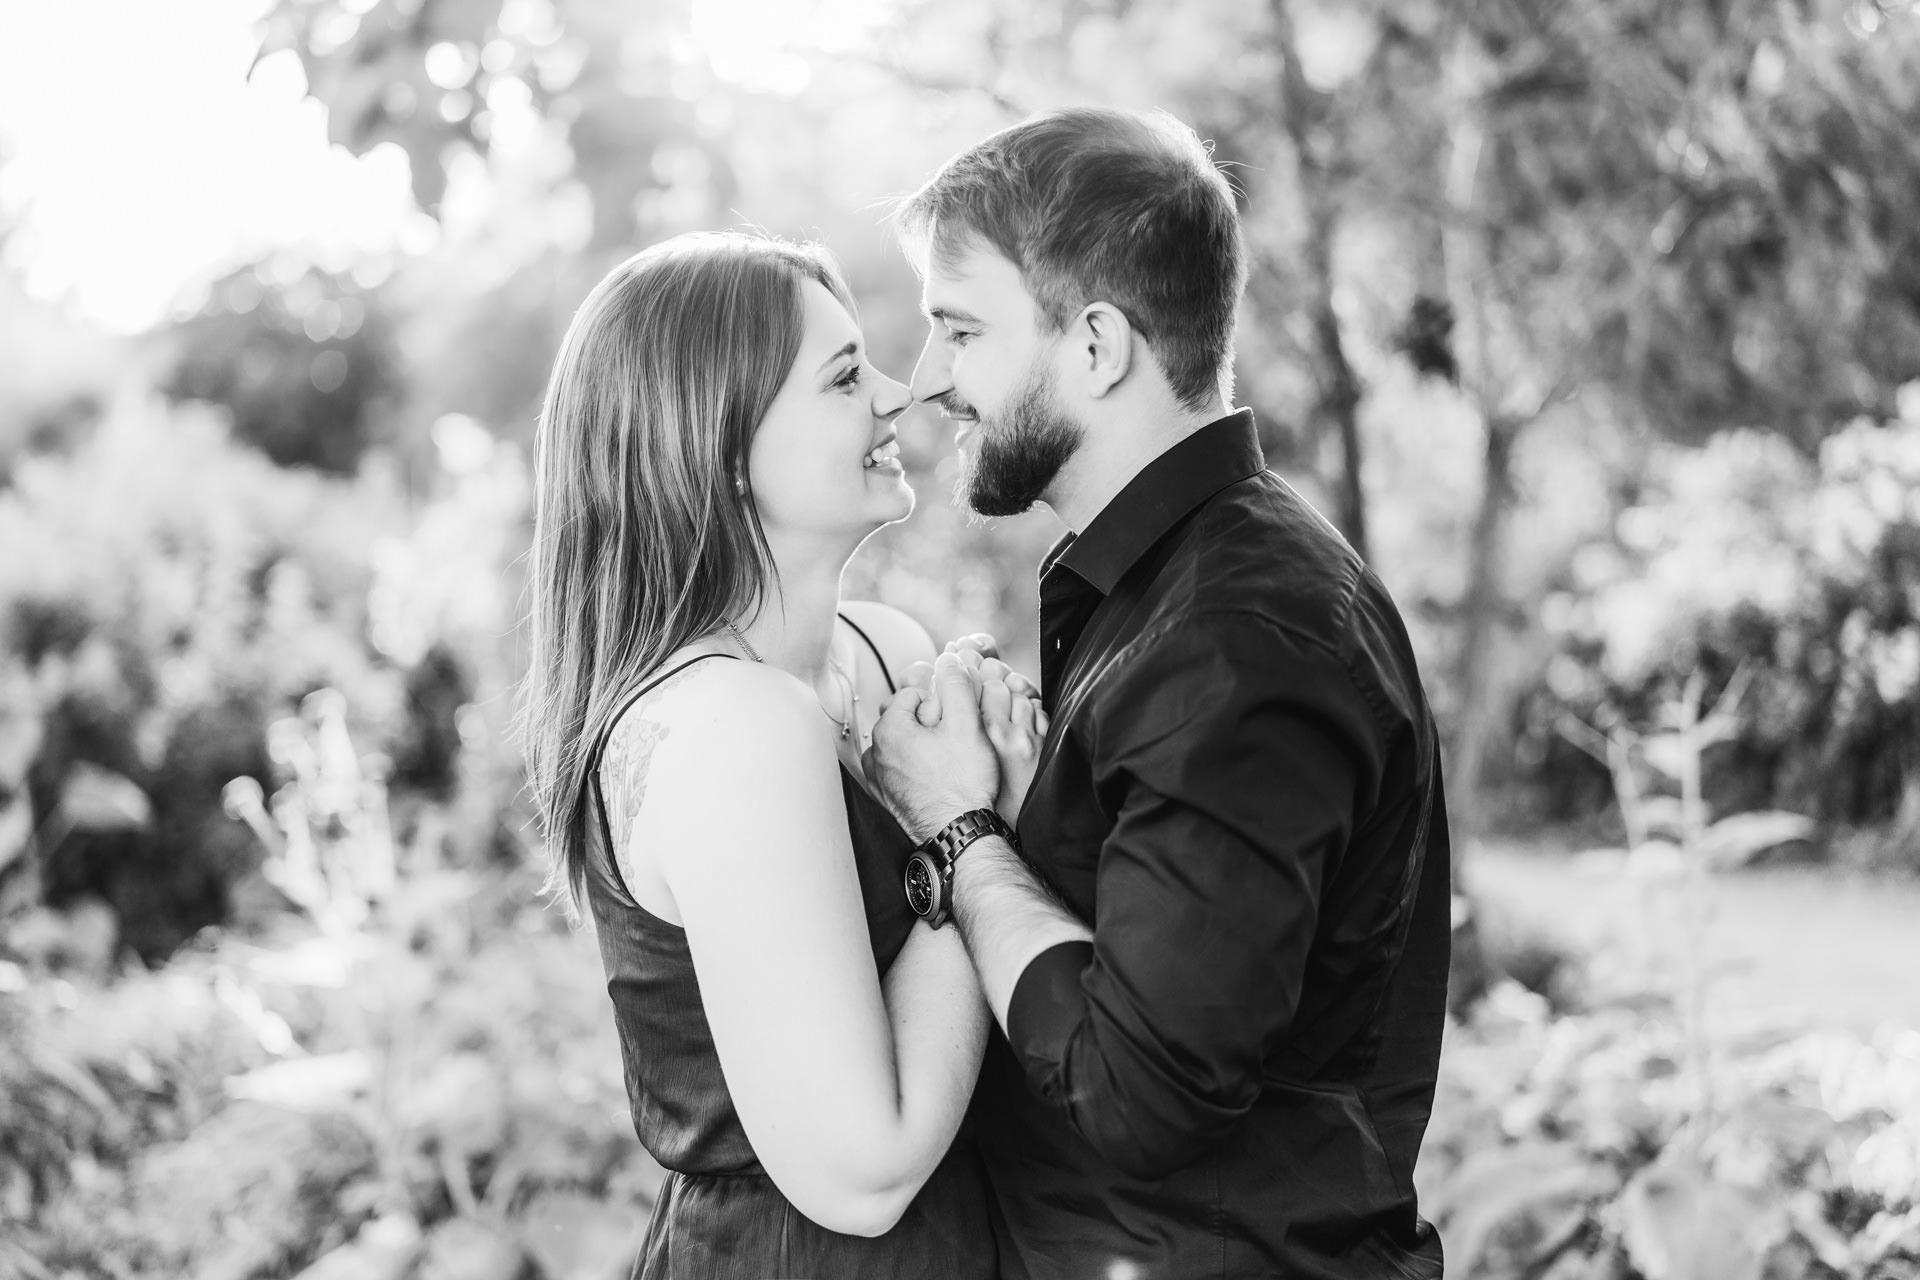 Natürliche Paarfotografie Fotoshooting Paare fotografieren